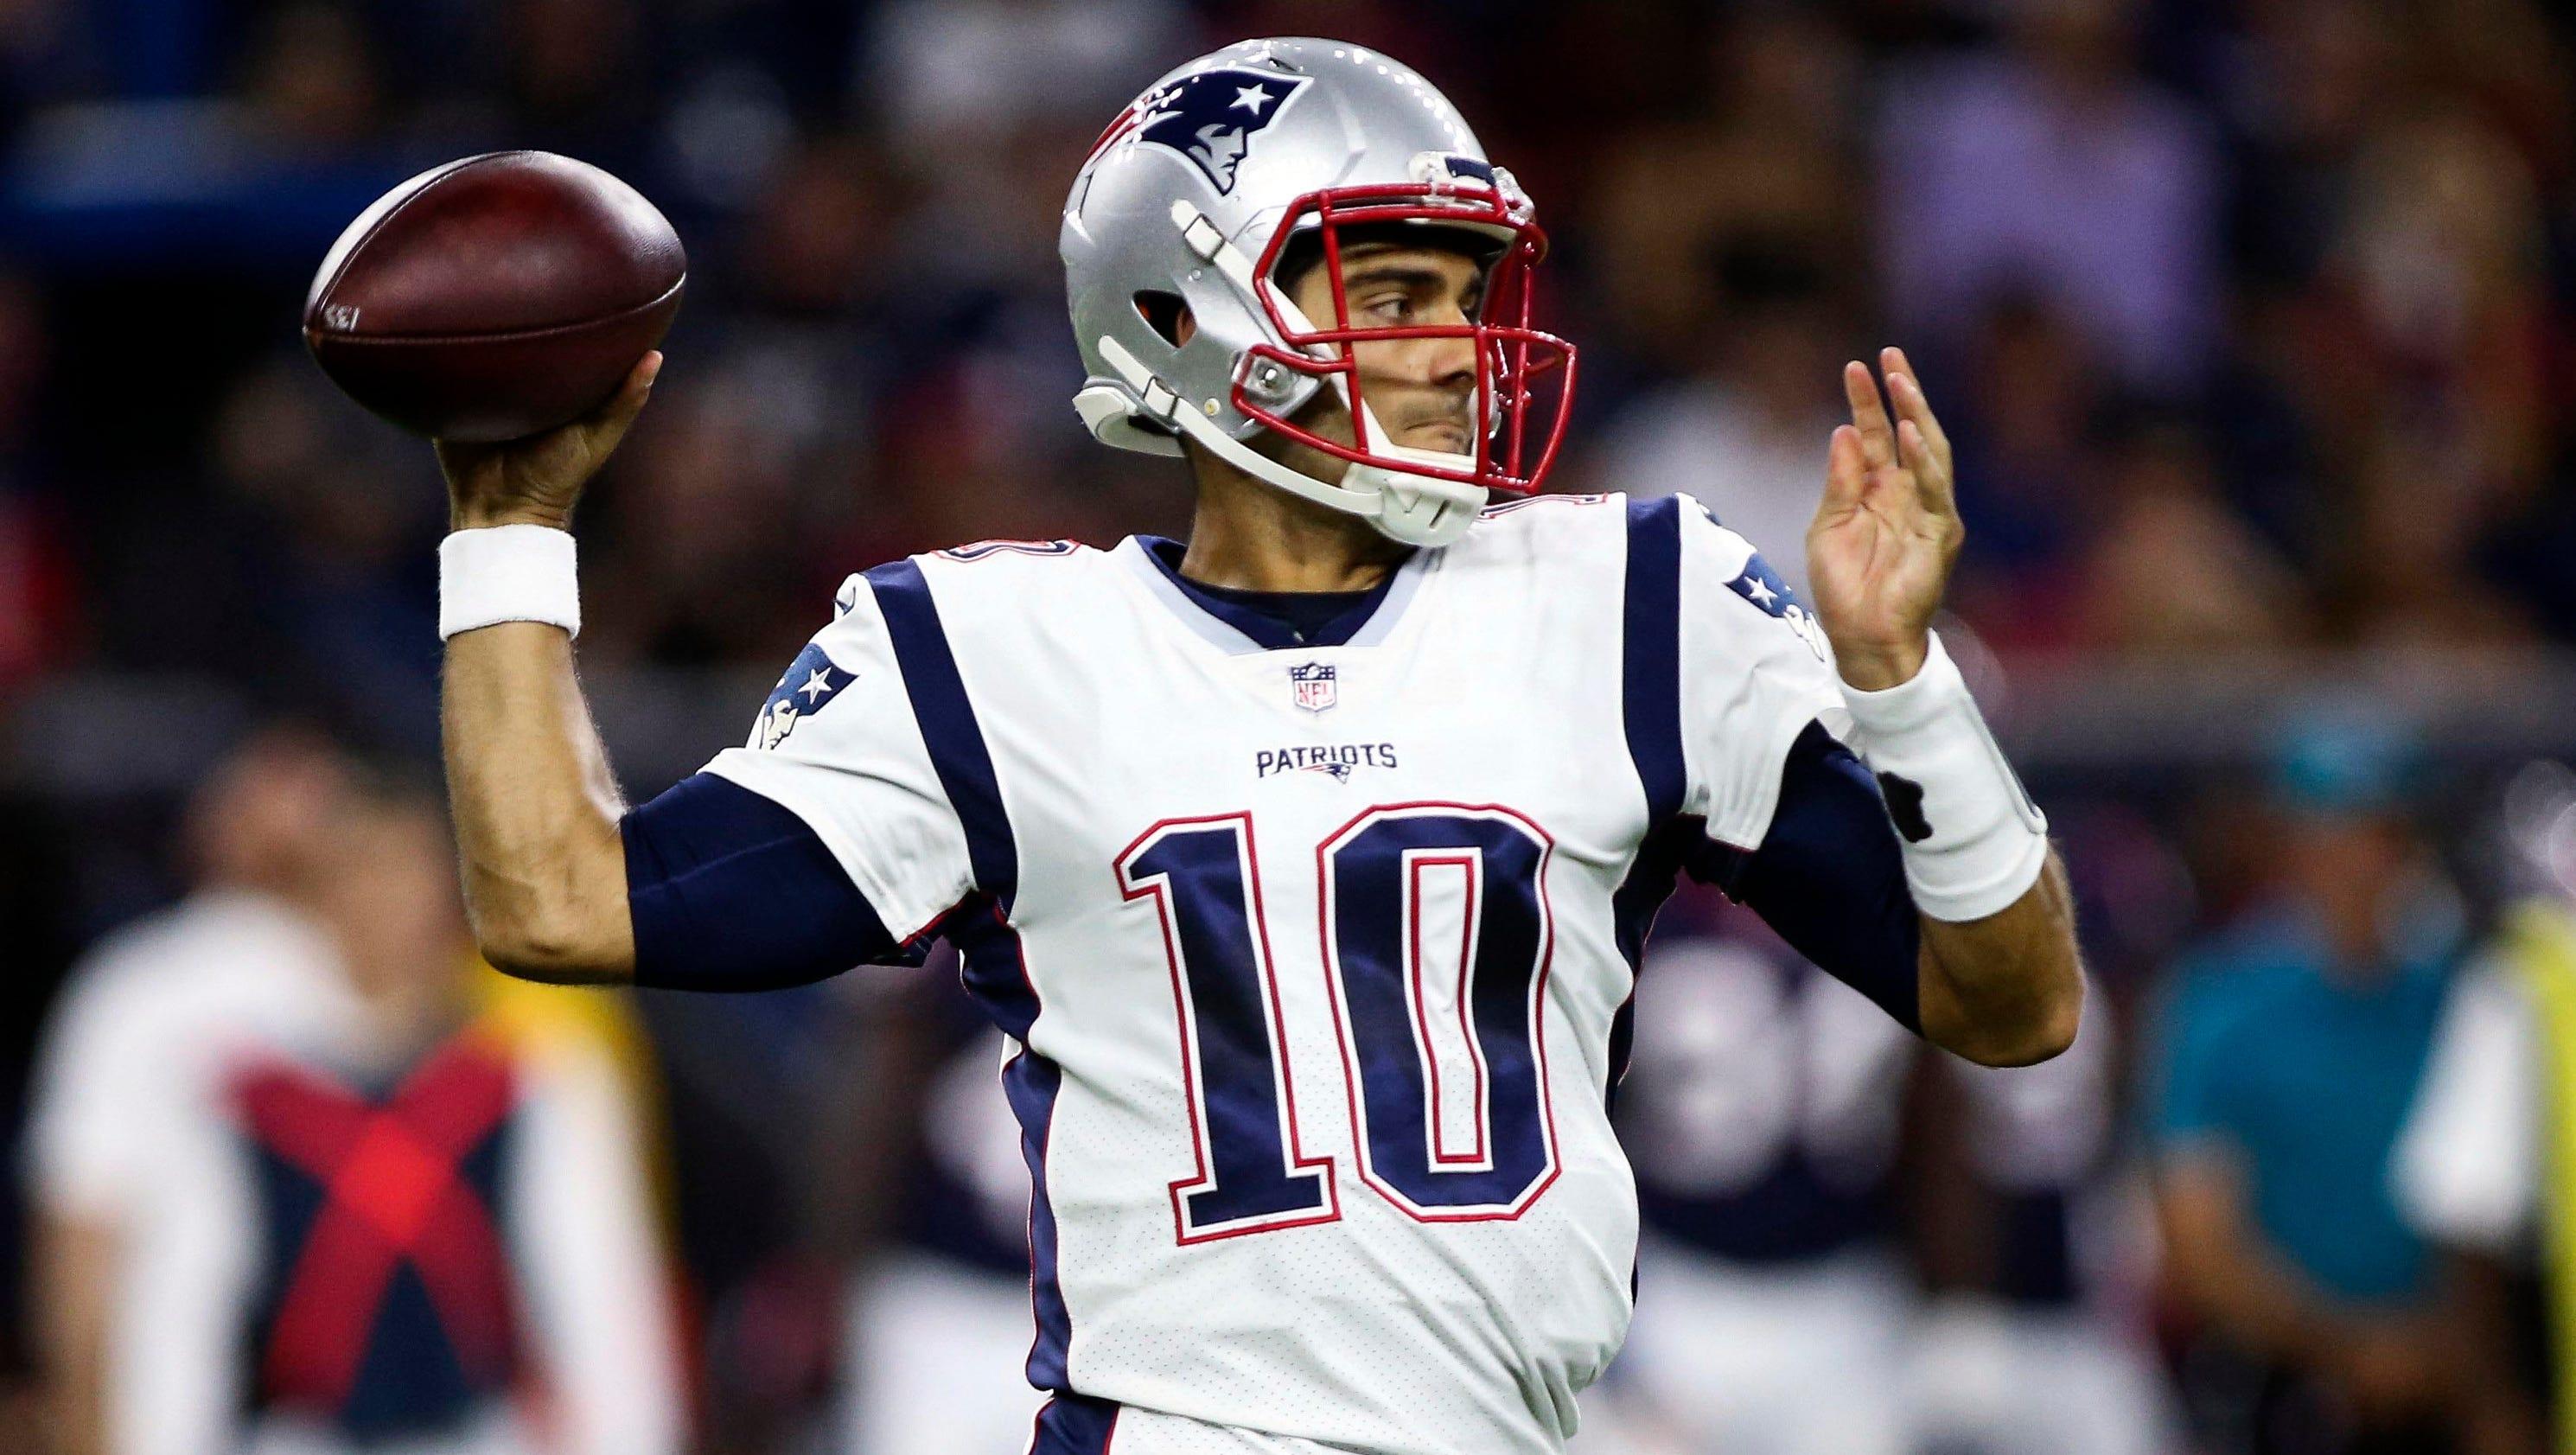 Ranking NFL backup quarterbacks: Patriots Jimmy Garoppolo tops list